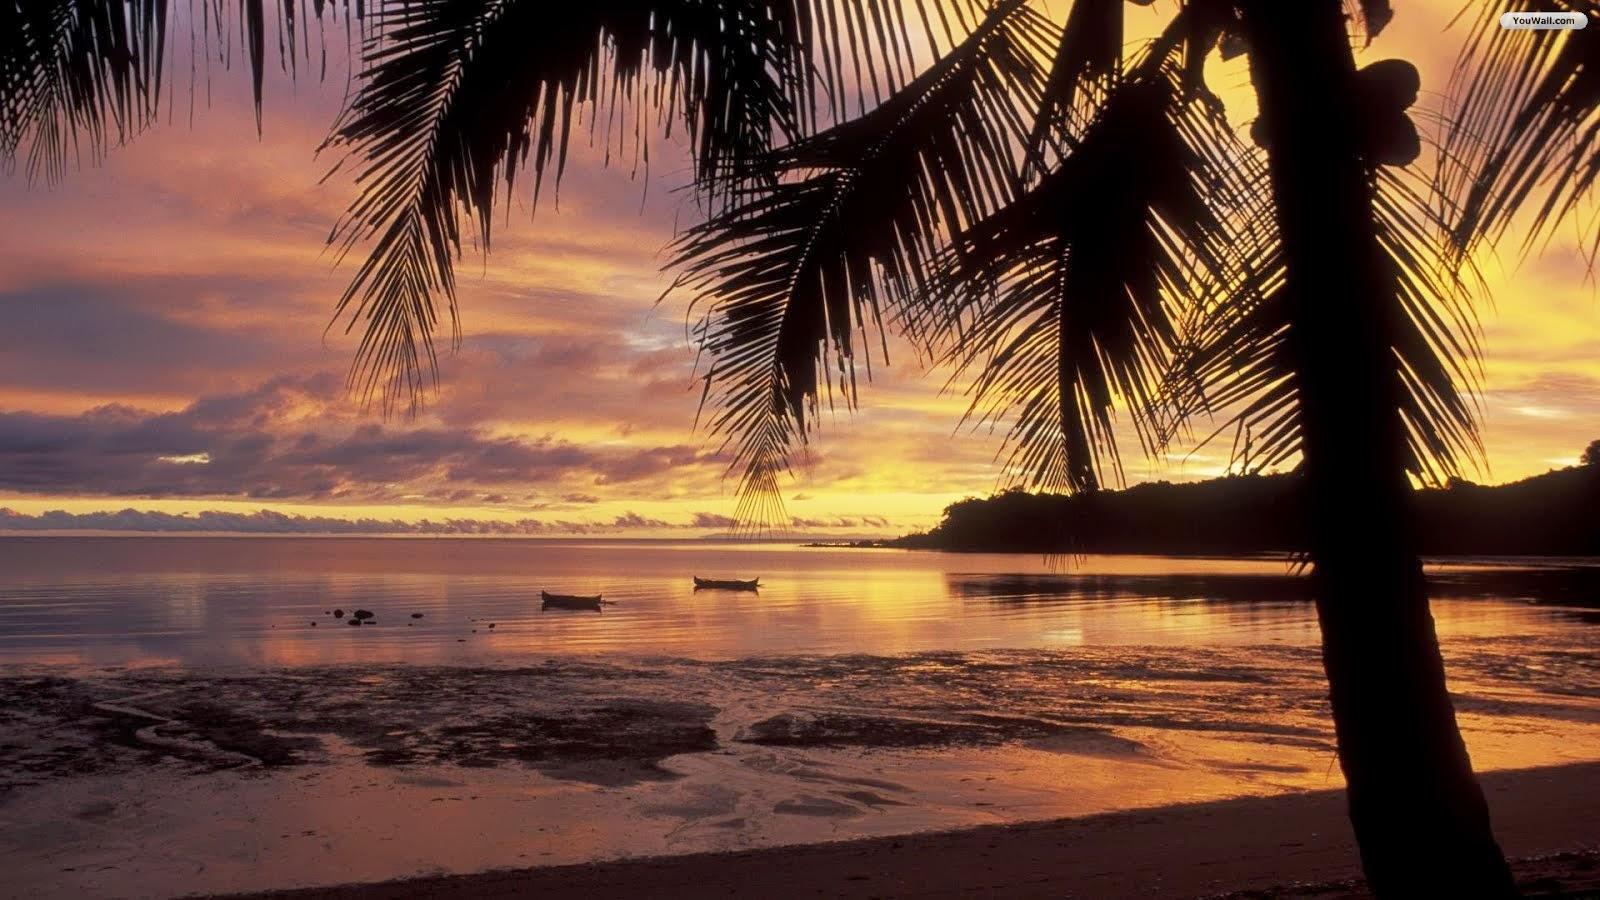 beach picture Beautiful Beach Sunset Wallpaper Wallpapers 1600x900